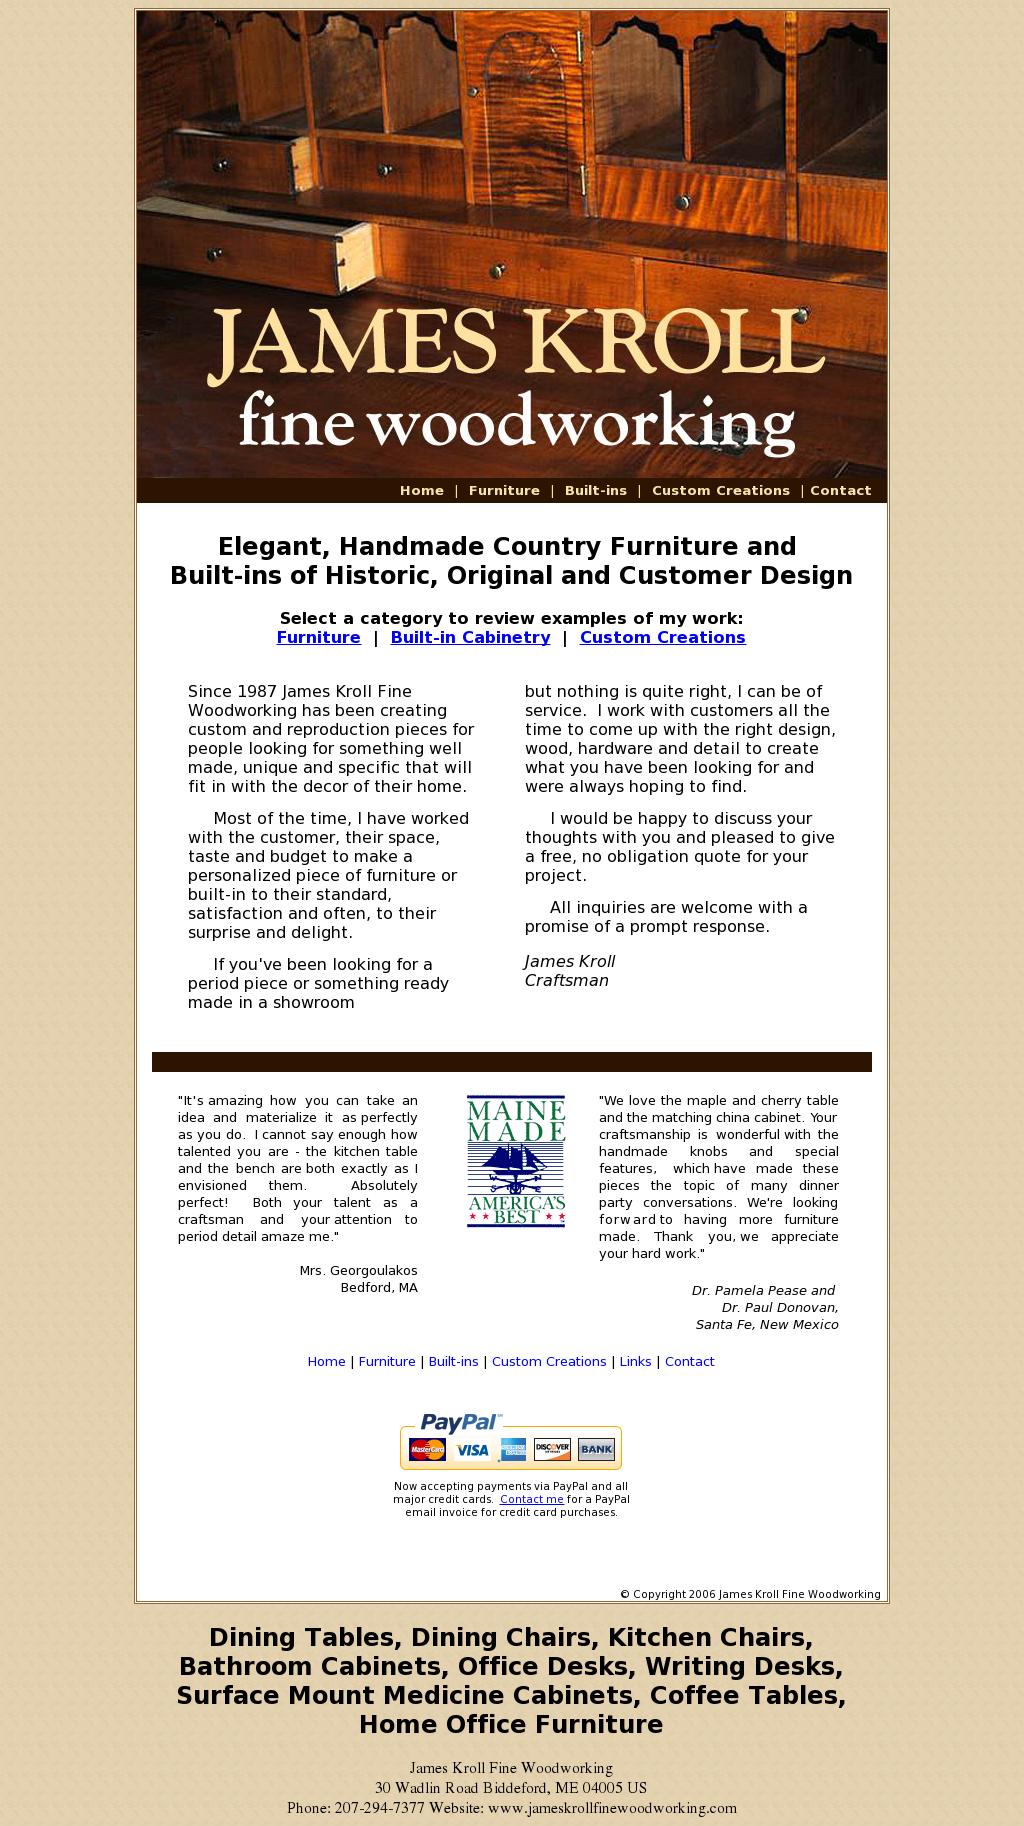 James Kroll Fine Woodworking Website History